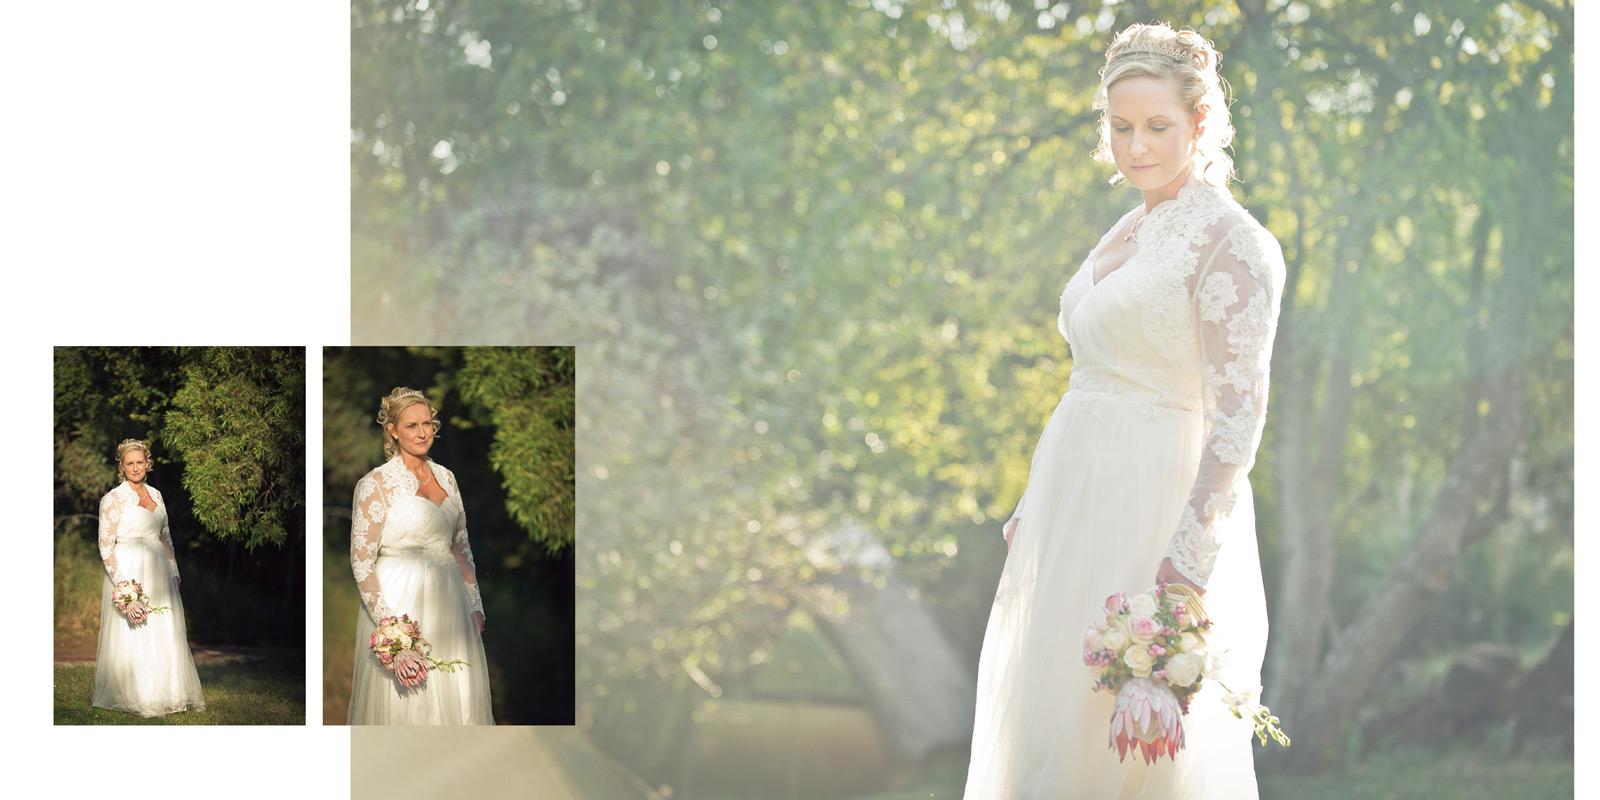 Nathalie Boucry Photography | Deidre and Lister Wedding Album 016